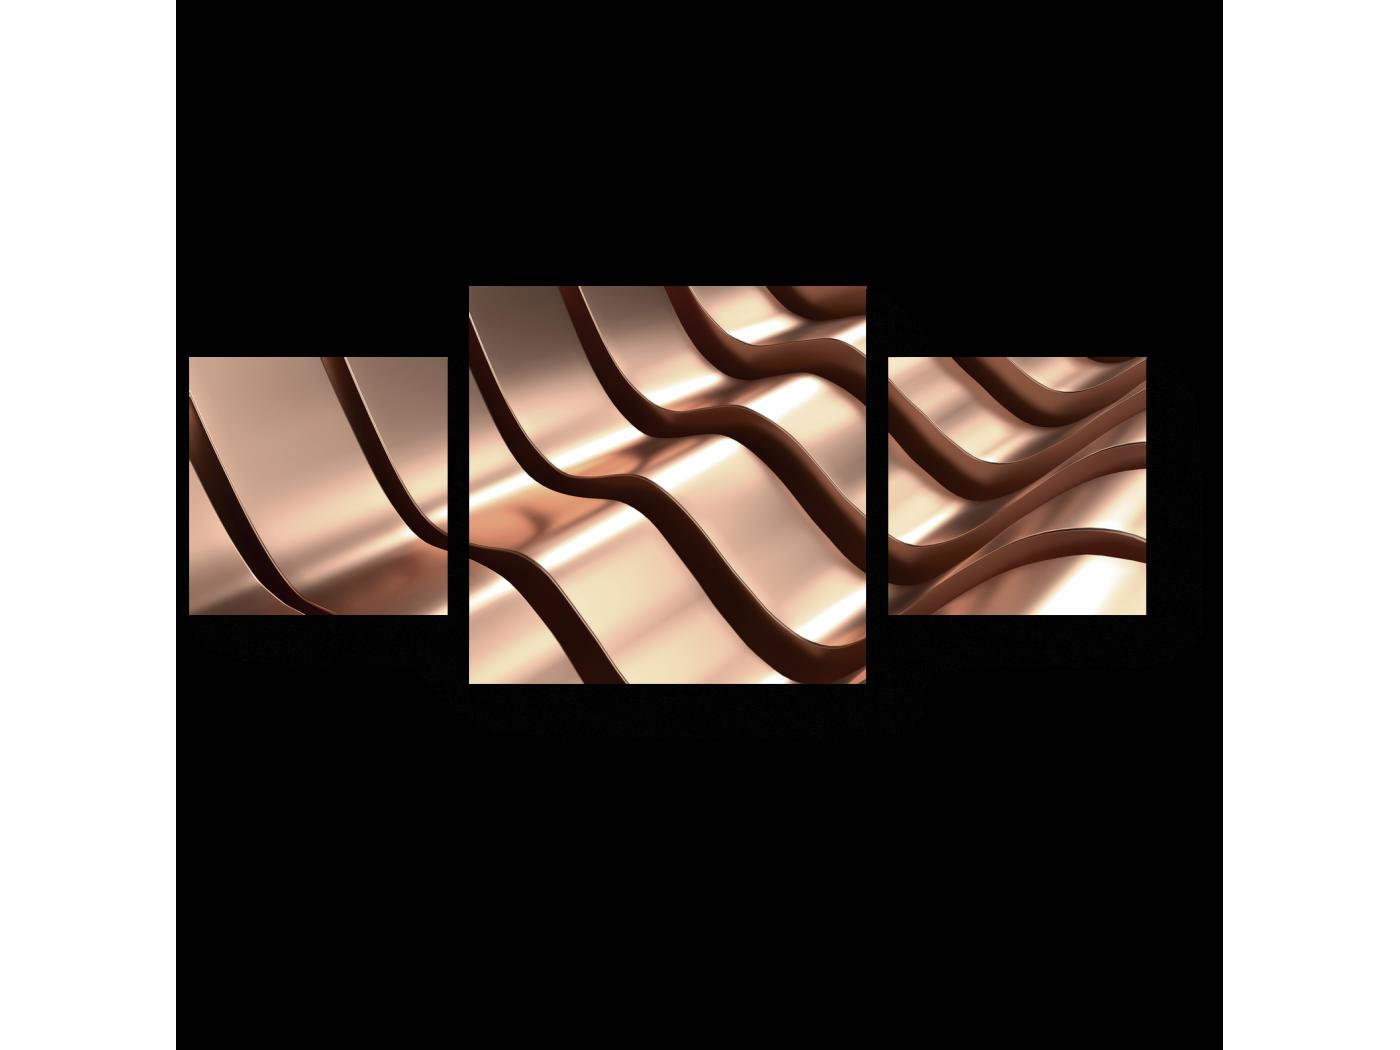 Модульная картина Волны розового золота (70x30) фото